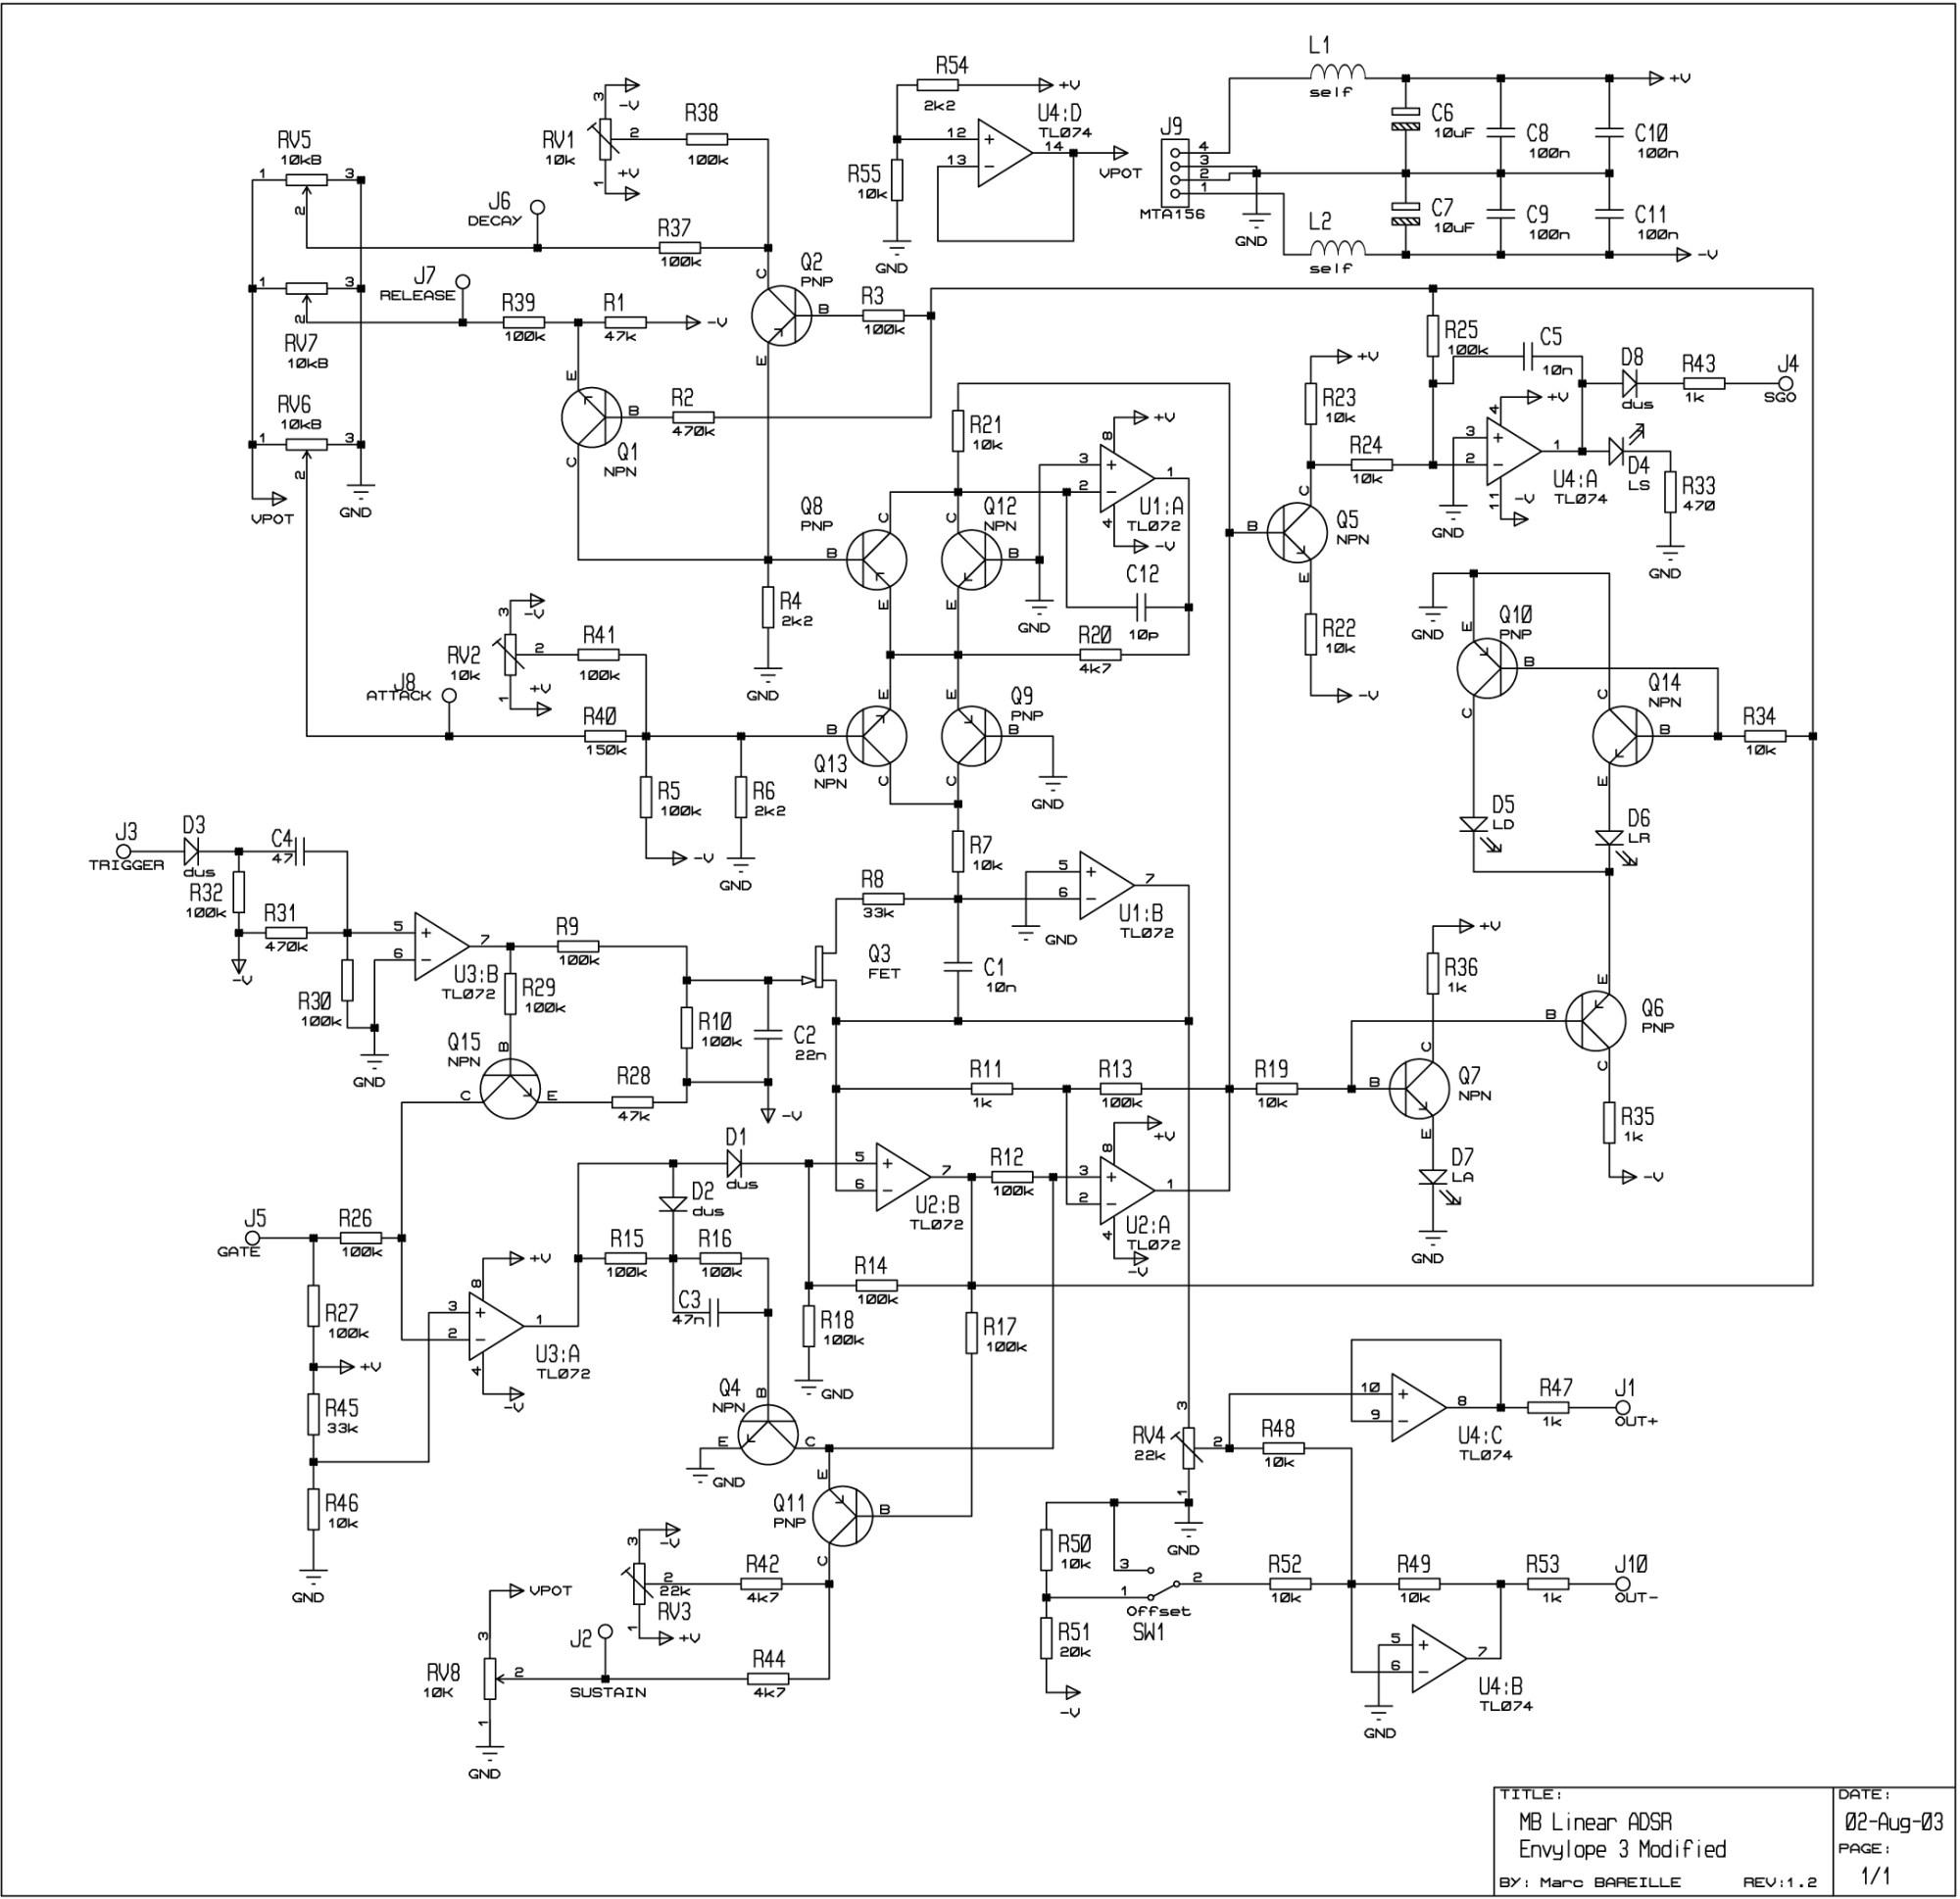 hight resolution of  wave wiper schematics cv mega mixer by ken stone adsr based on cem3310 chip by scott bernardi listbytype envelope follower by rene schmitz